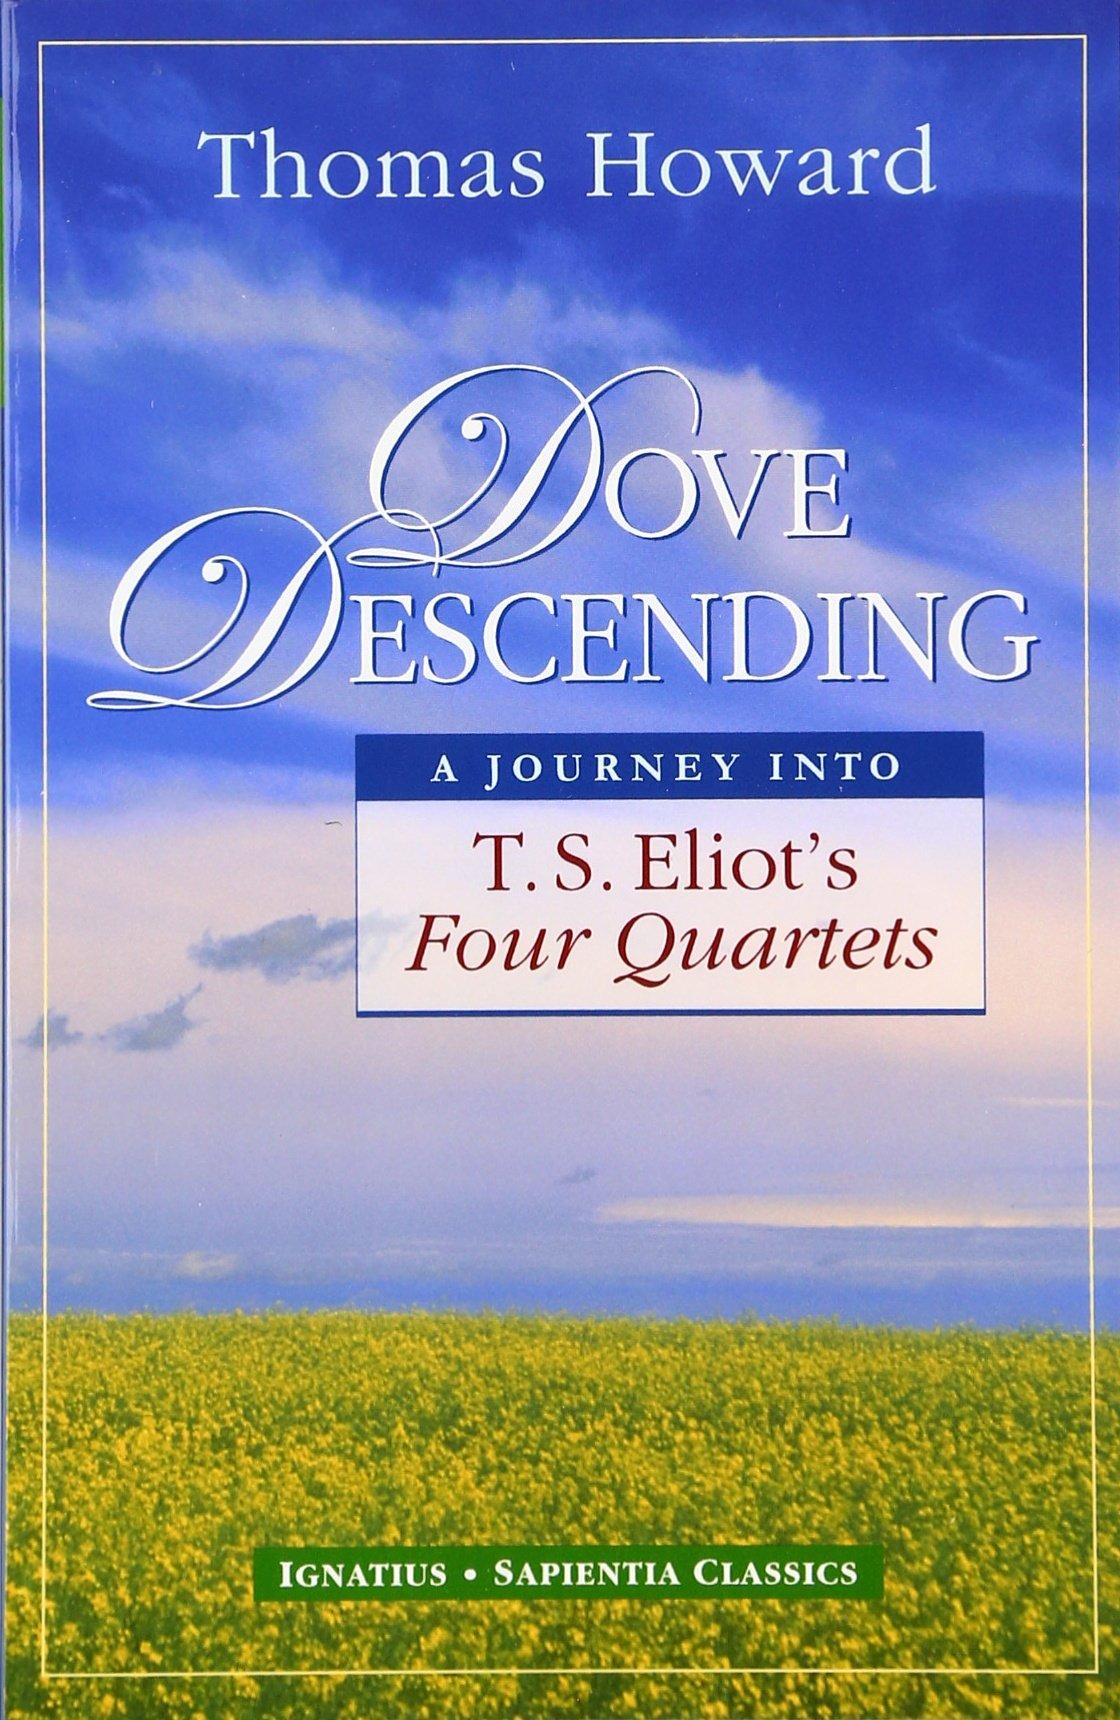 Amazon.com: Dove Descending: A Journey into T.S. Eliot's Four Quartets (Sapientia Classics) (9781586170400): Howard, Thomas: Books